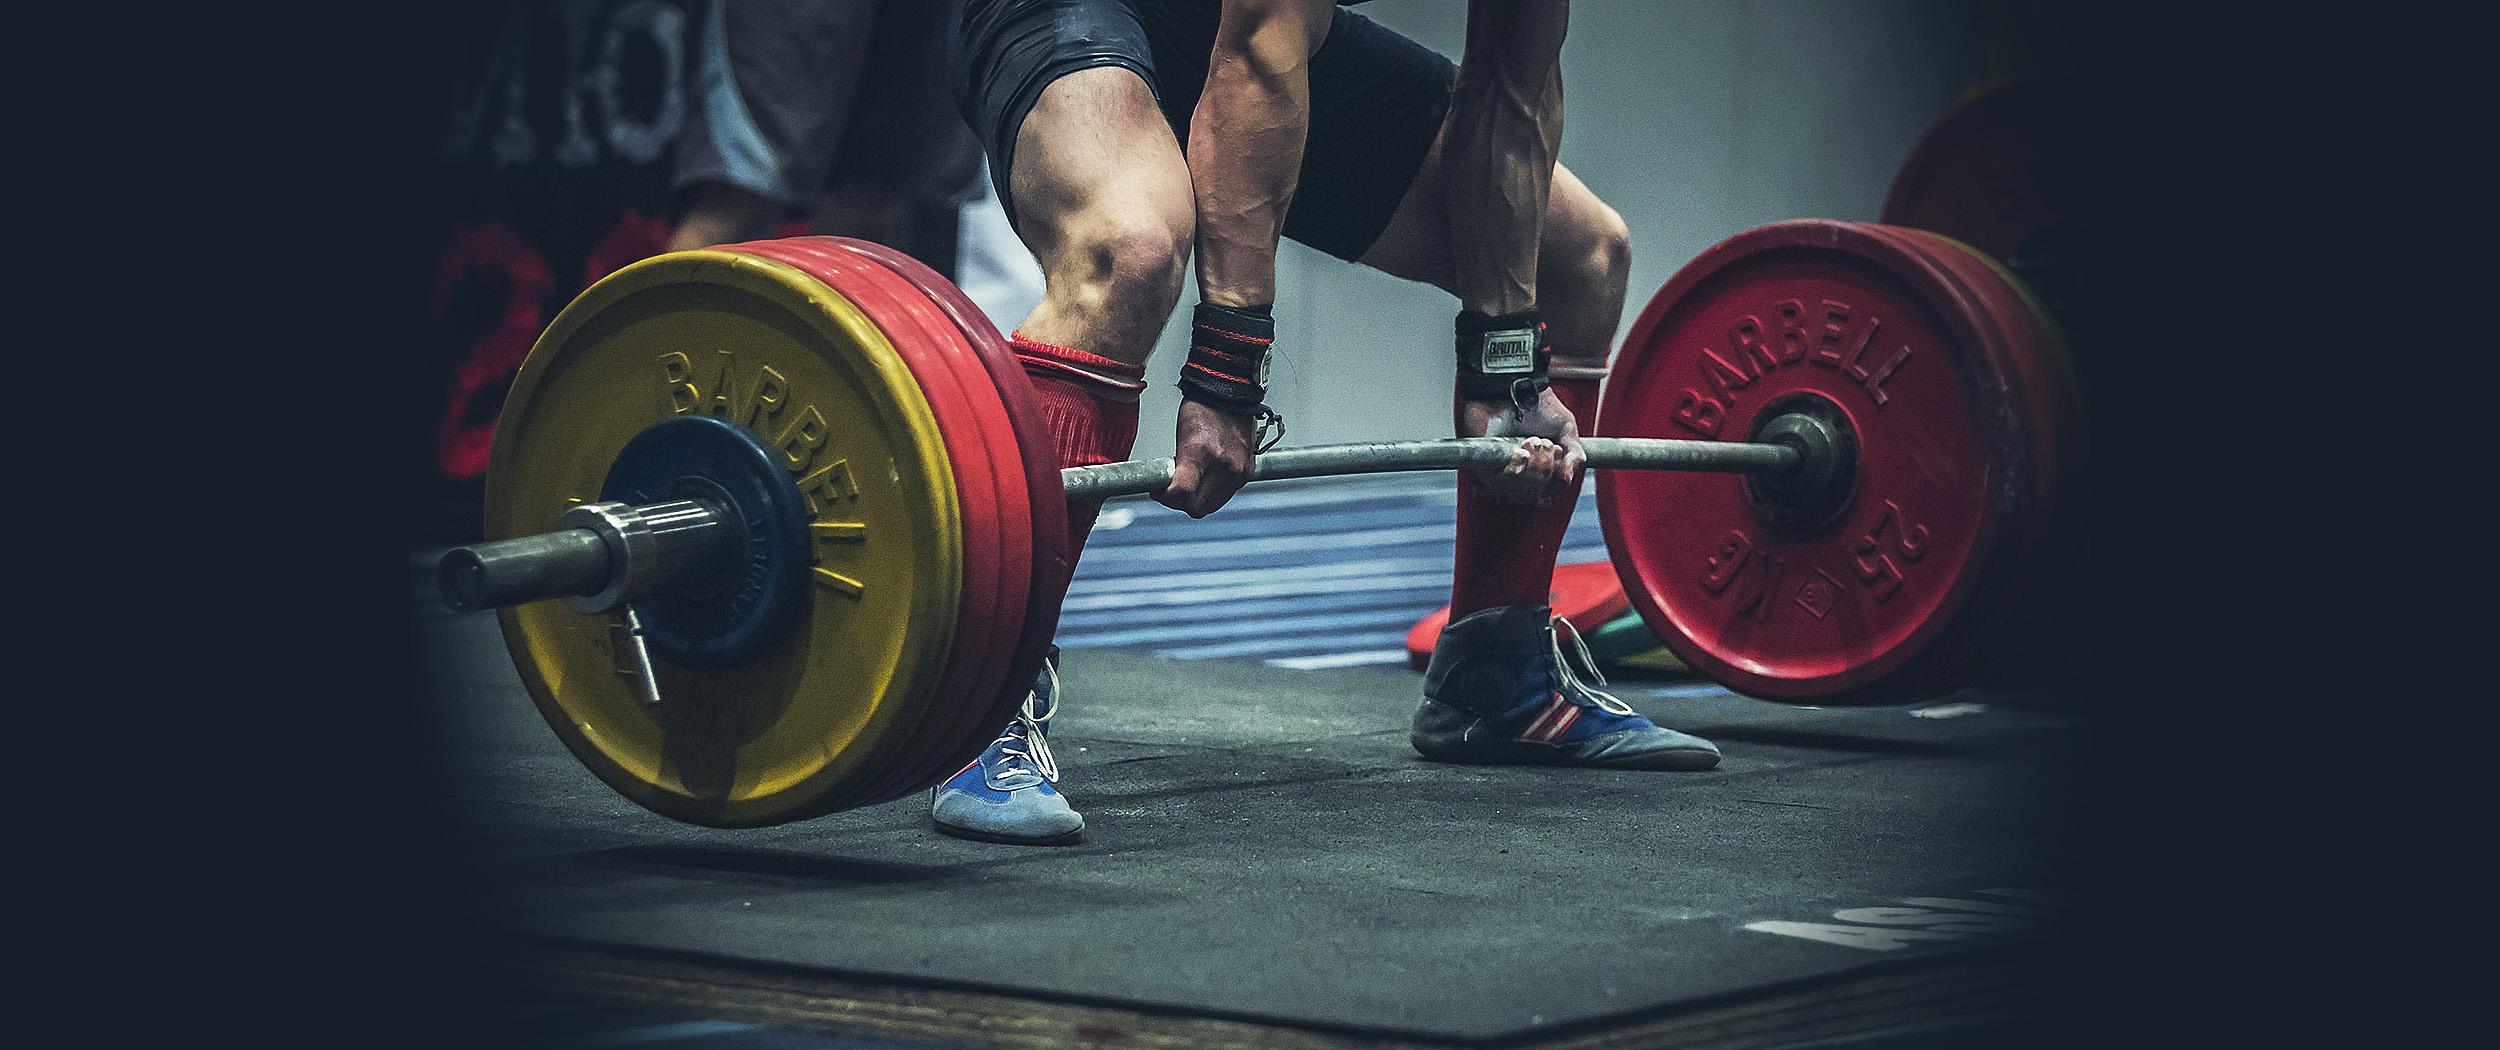 843bffdbaf5355 Squat-Stance Deadlifts  Strength   Size — Advanced Human Performance  Official Website